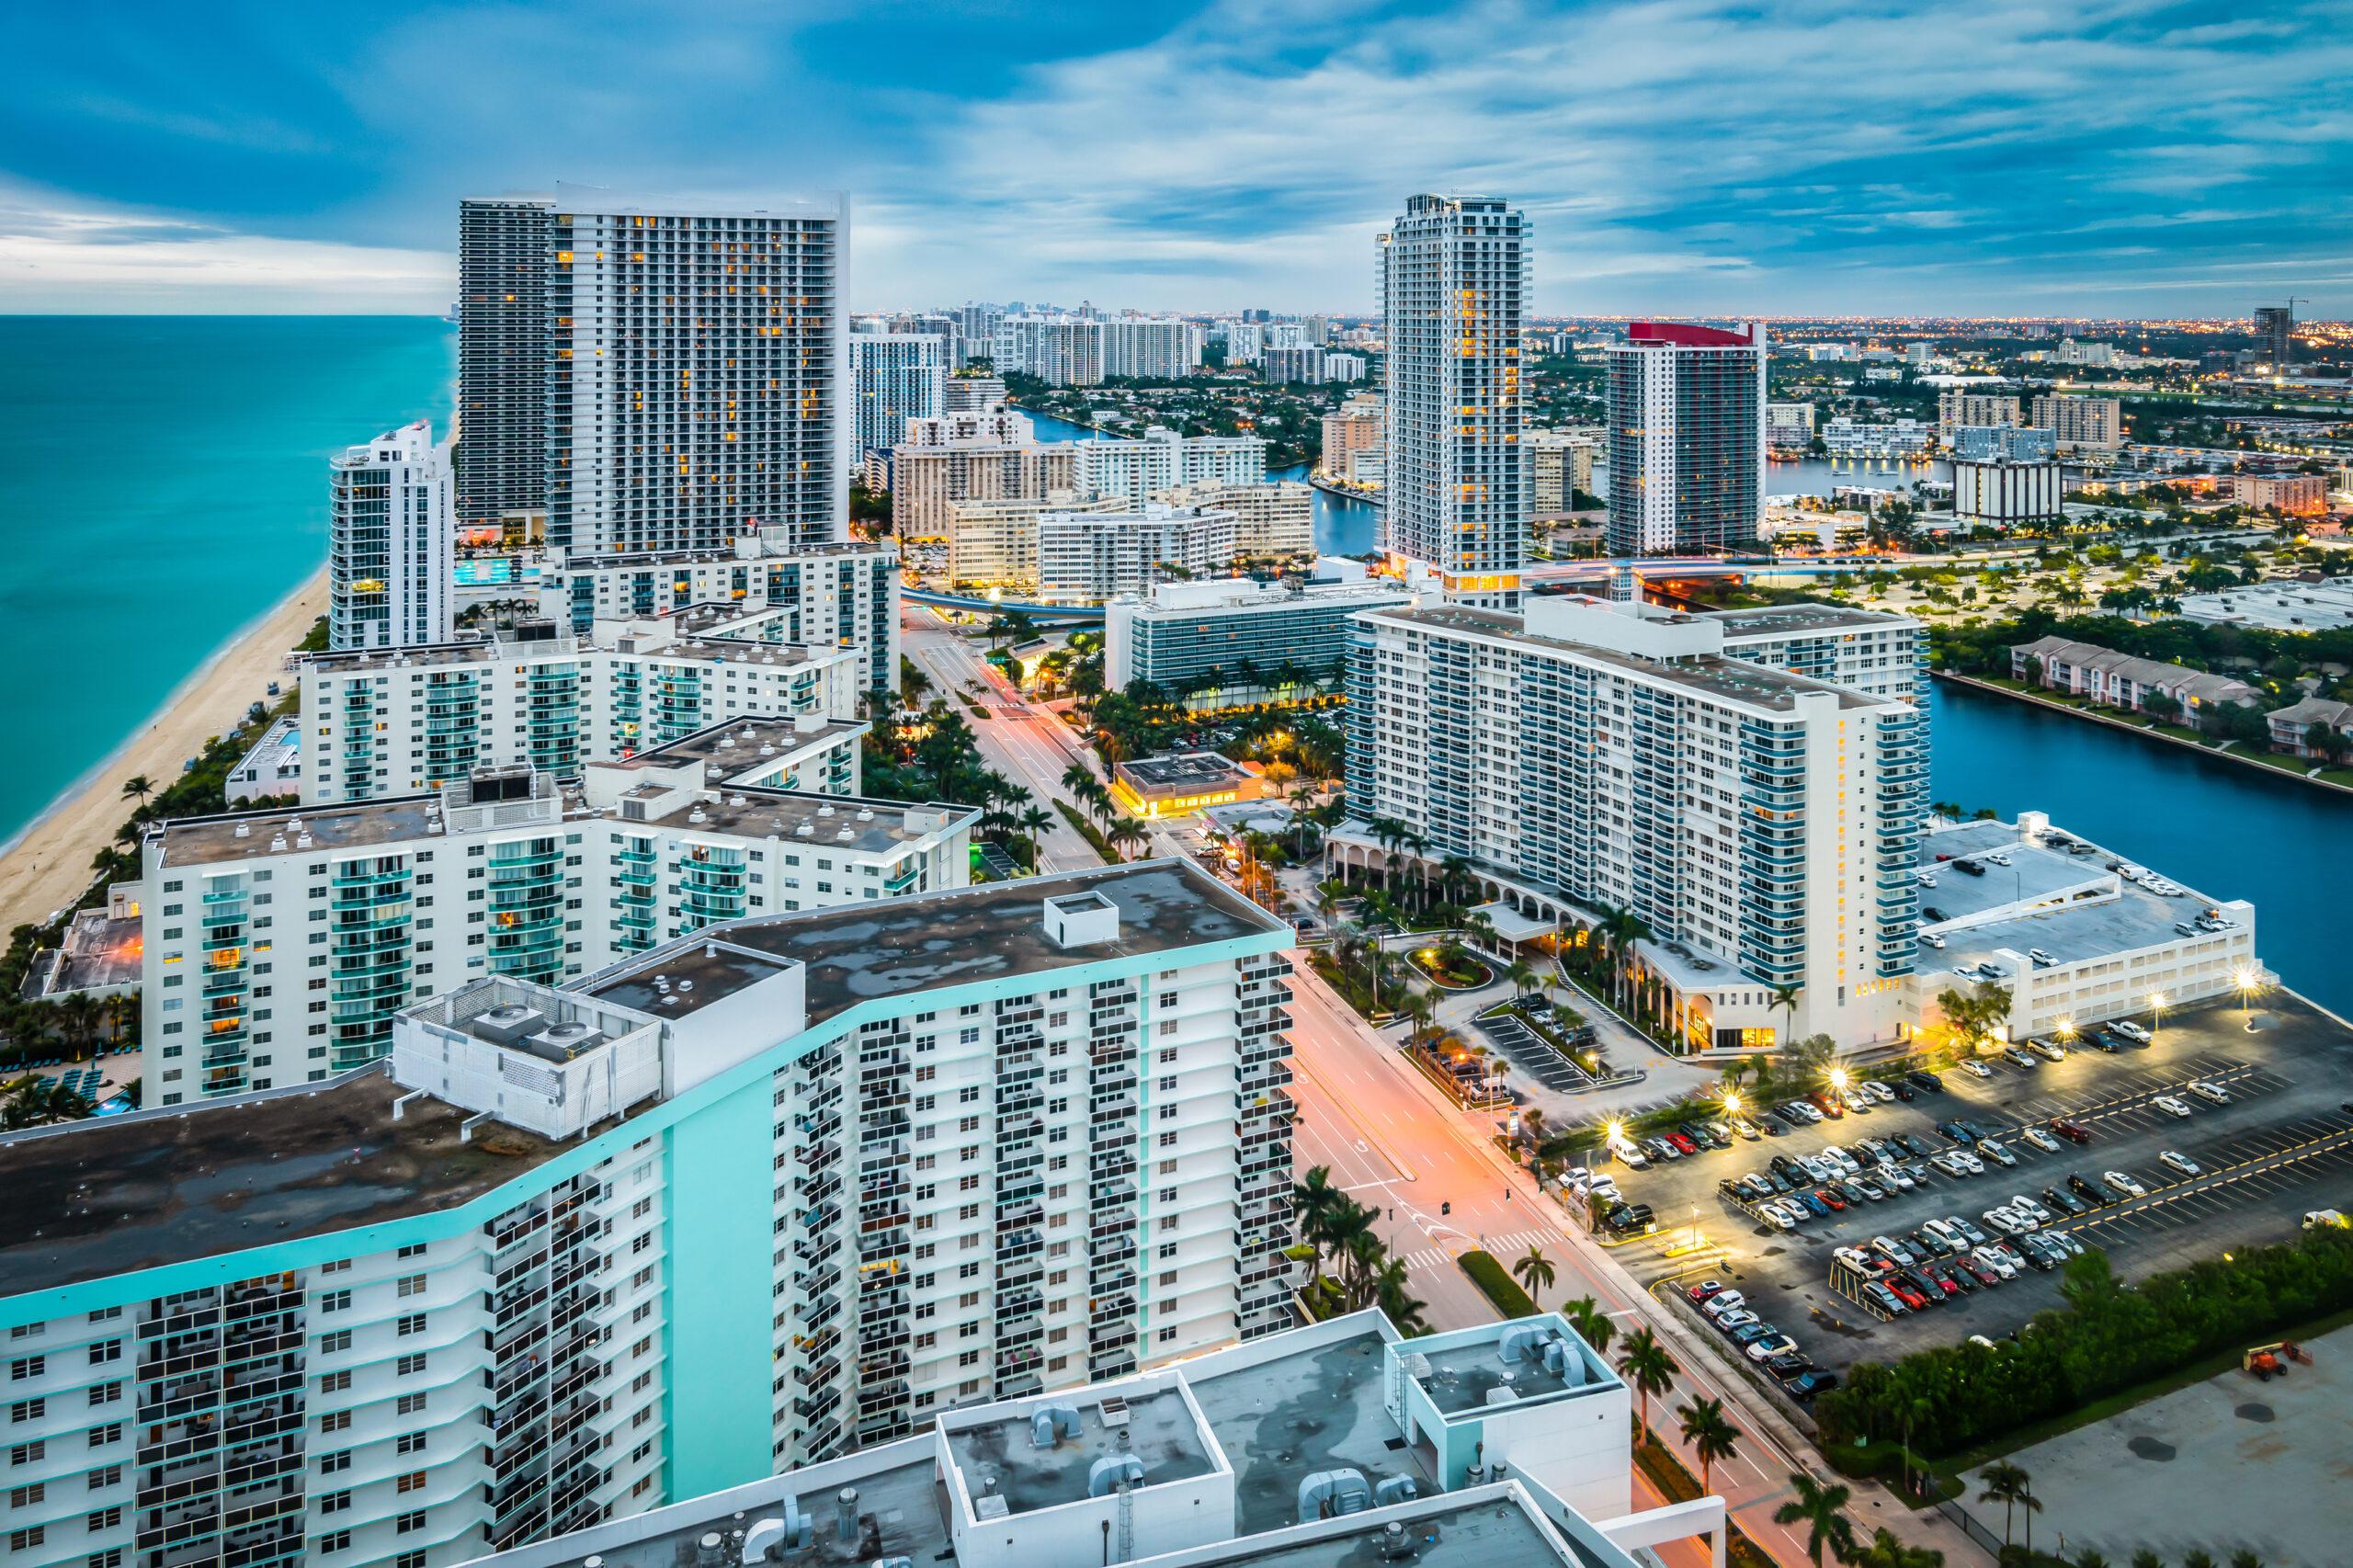 Hollywood, Florida's Pension Debt Problem